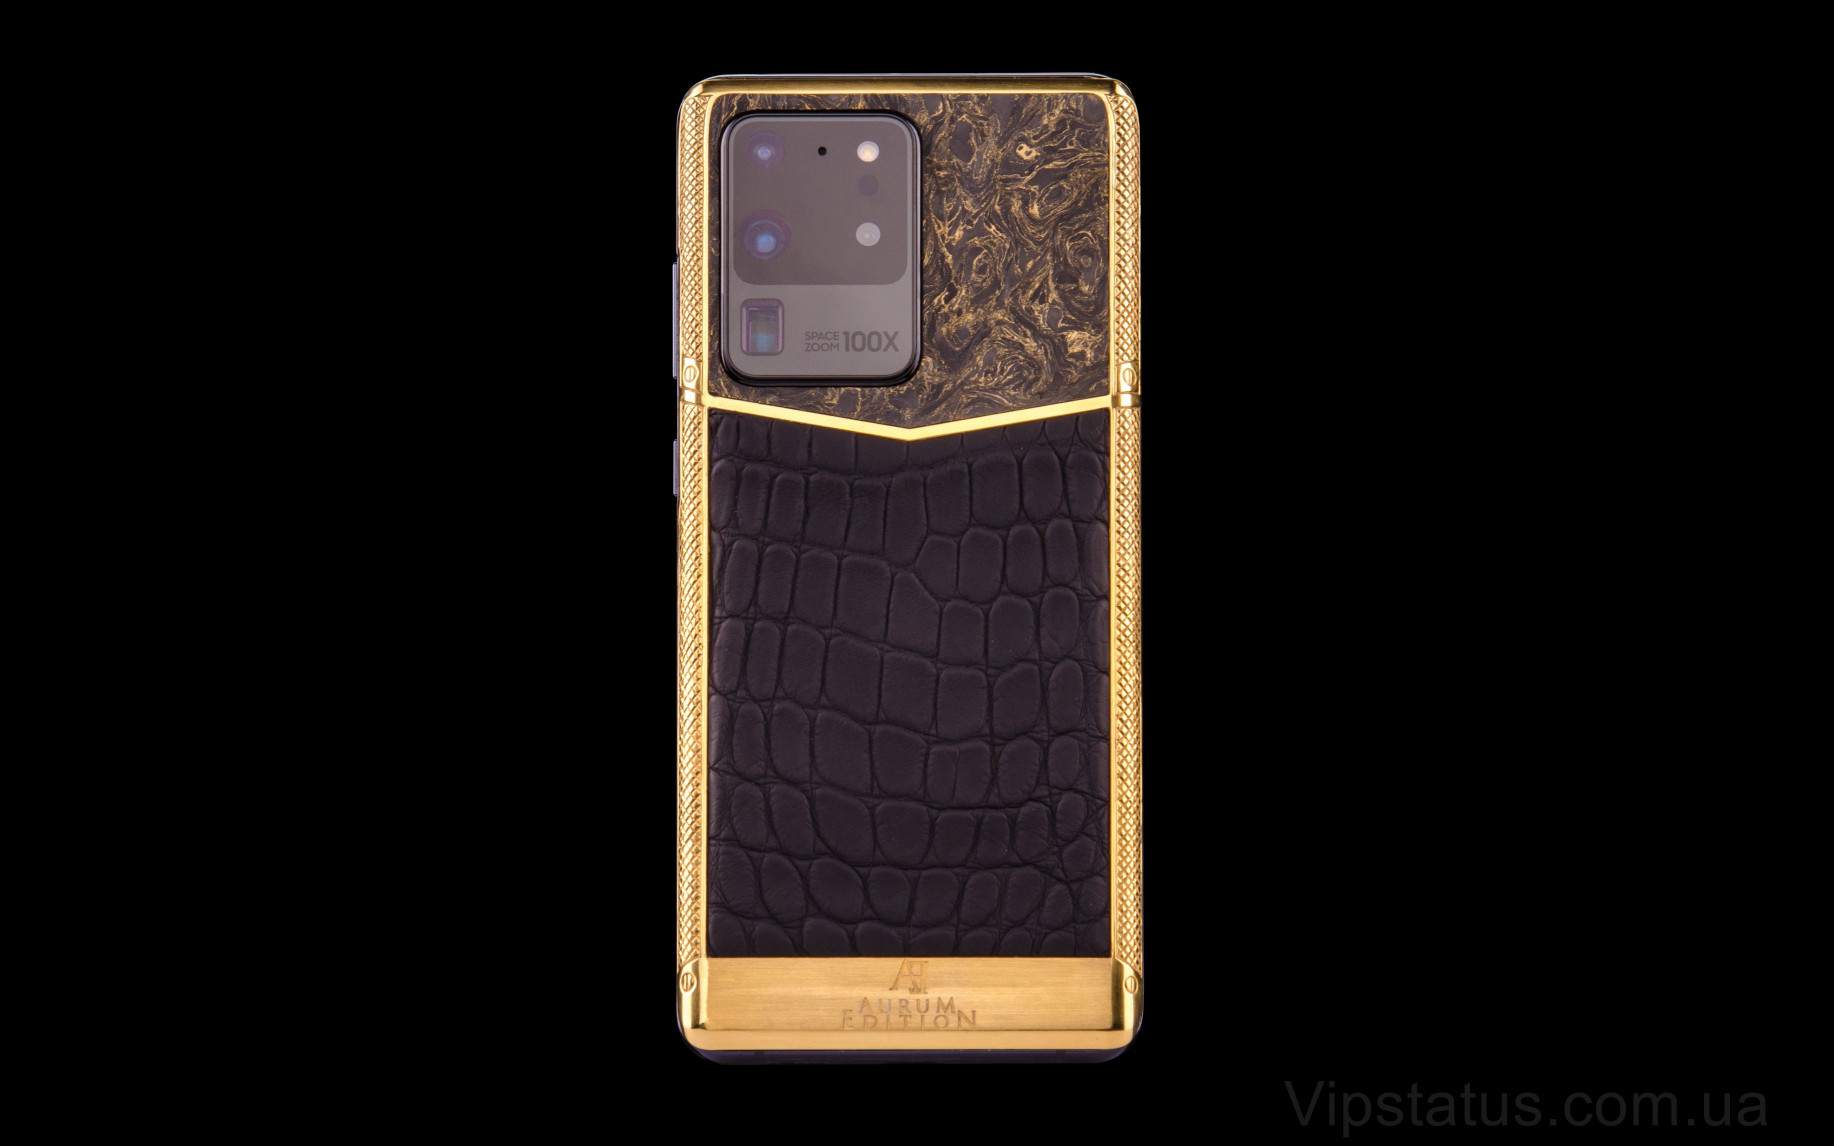 Elite Samsung S20 Gold Star Samsung S20 Gold Star image 5